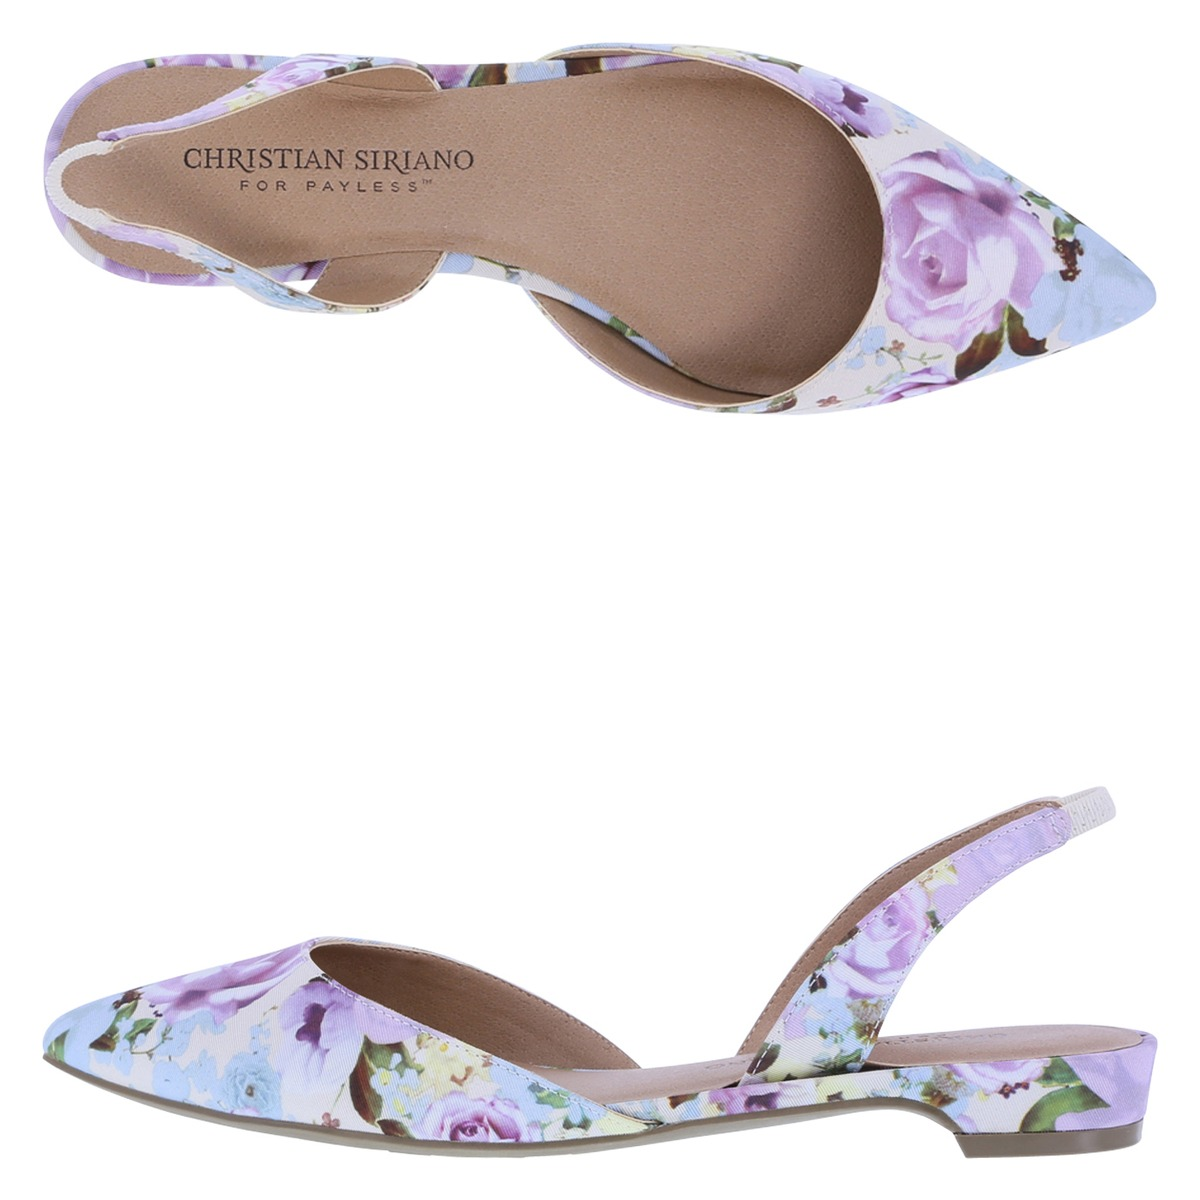 dfc3d79fbb30 Zapatos Mujer Christian Siriano Betty  negro Horma -   117.626 en ...